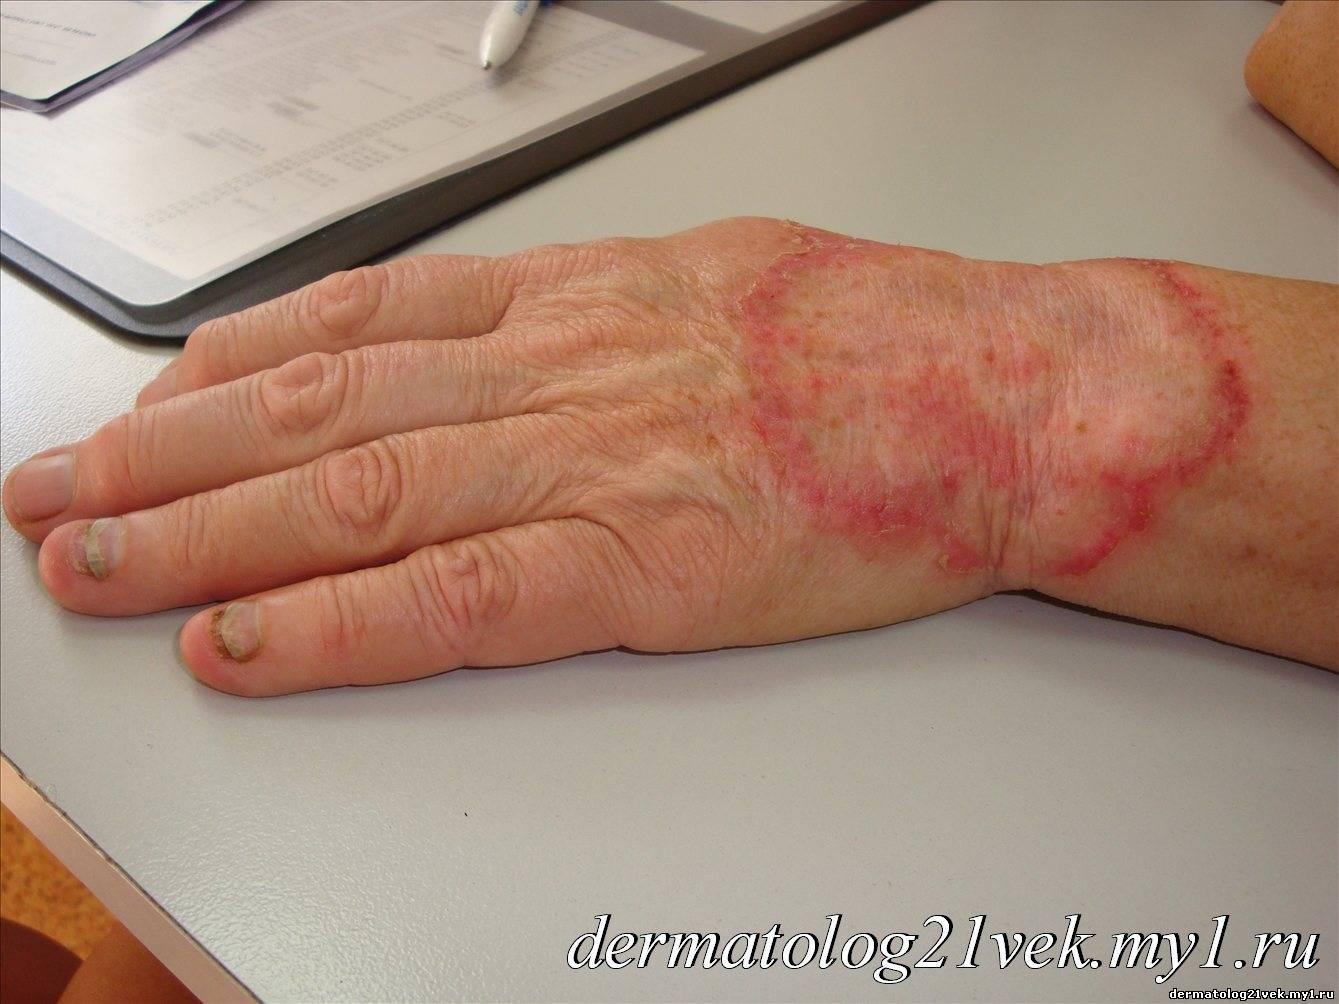 """,""dermatolog21vek.my1.ru"